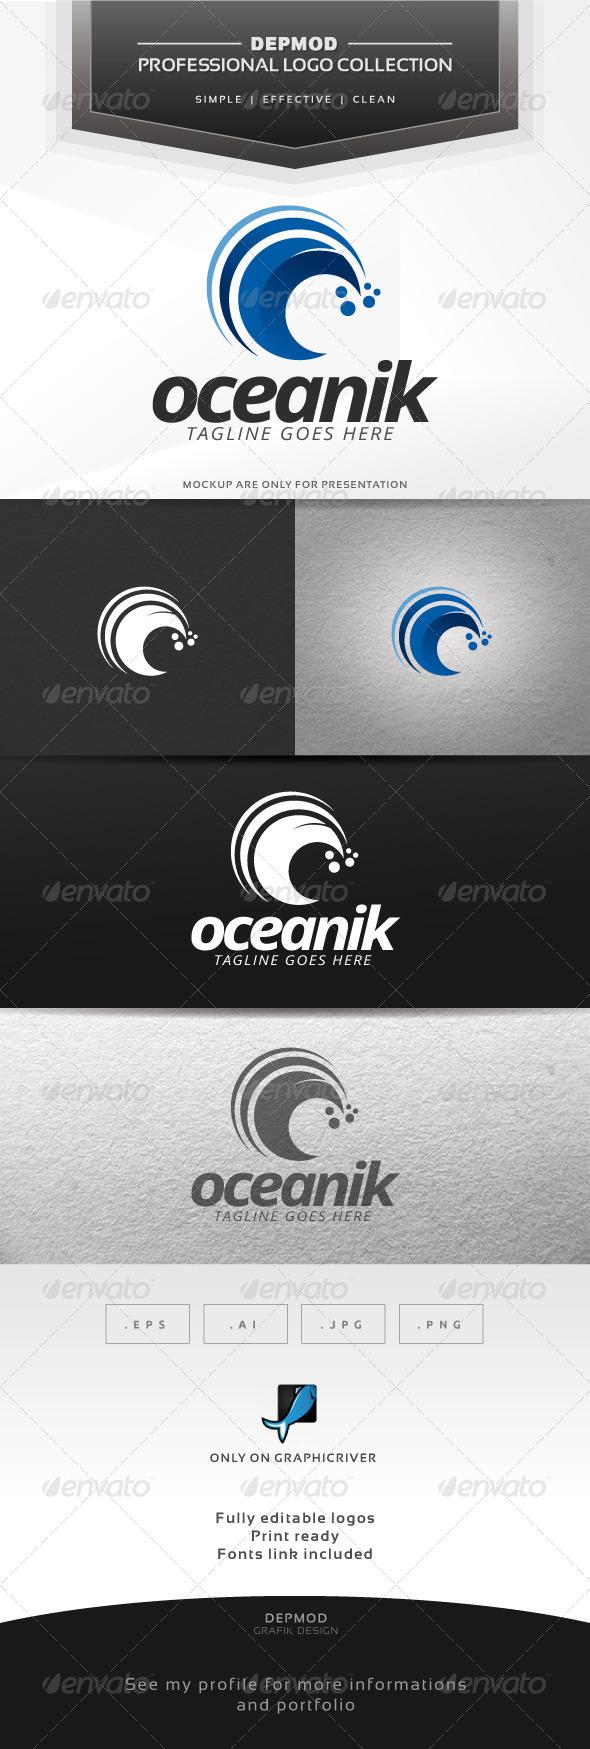 GraphicRiver Oceanik Logo 6423248